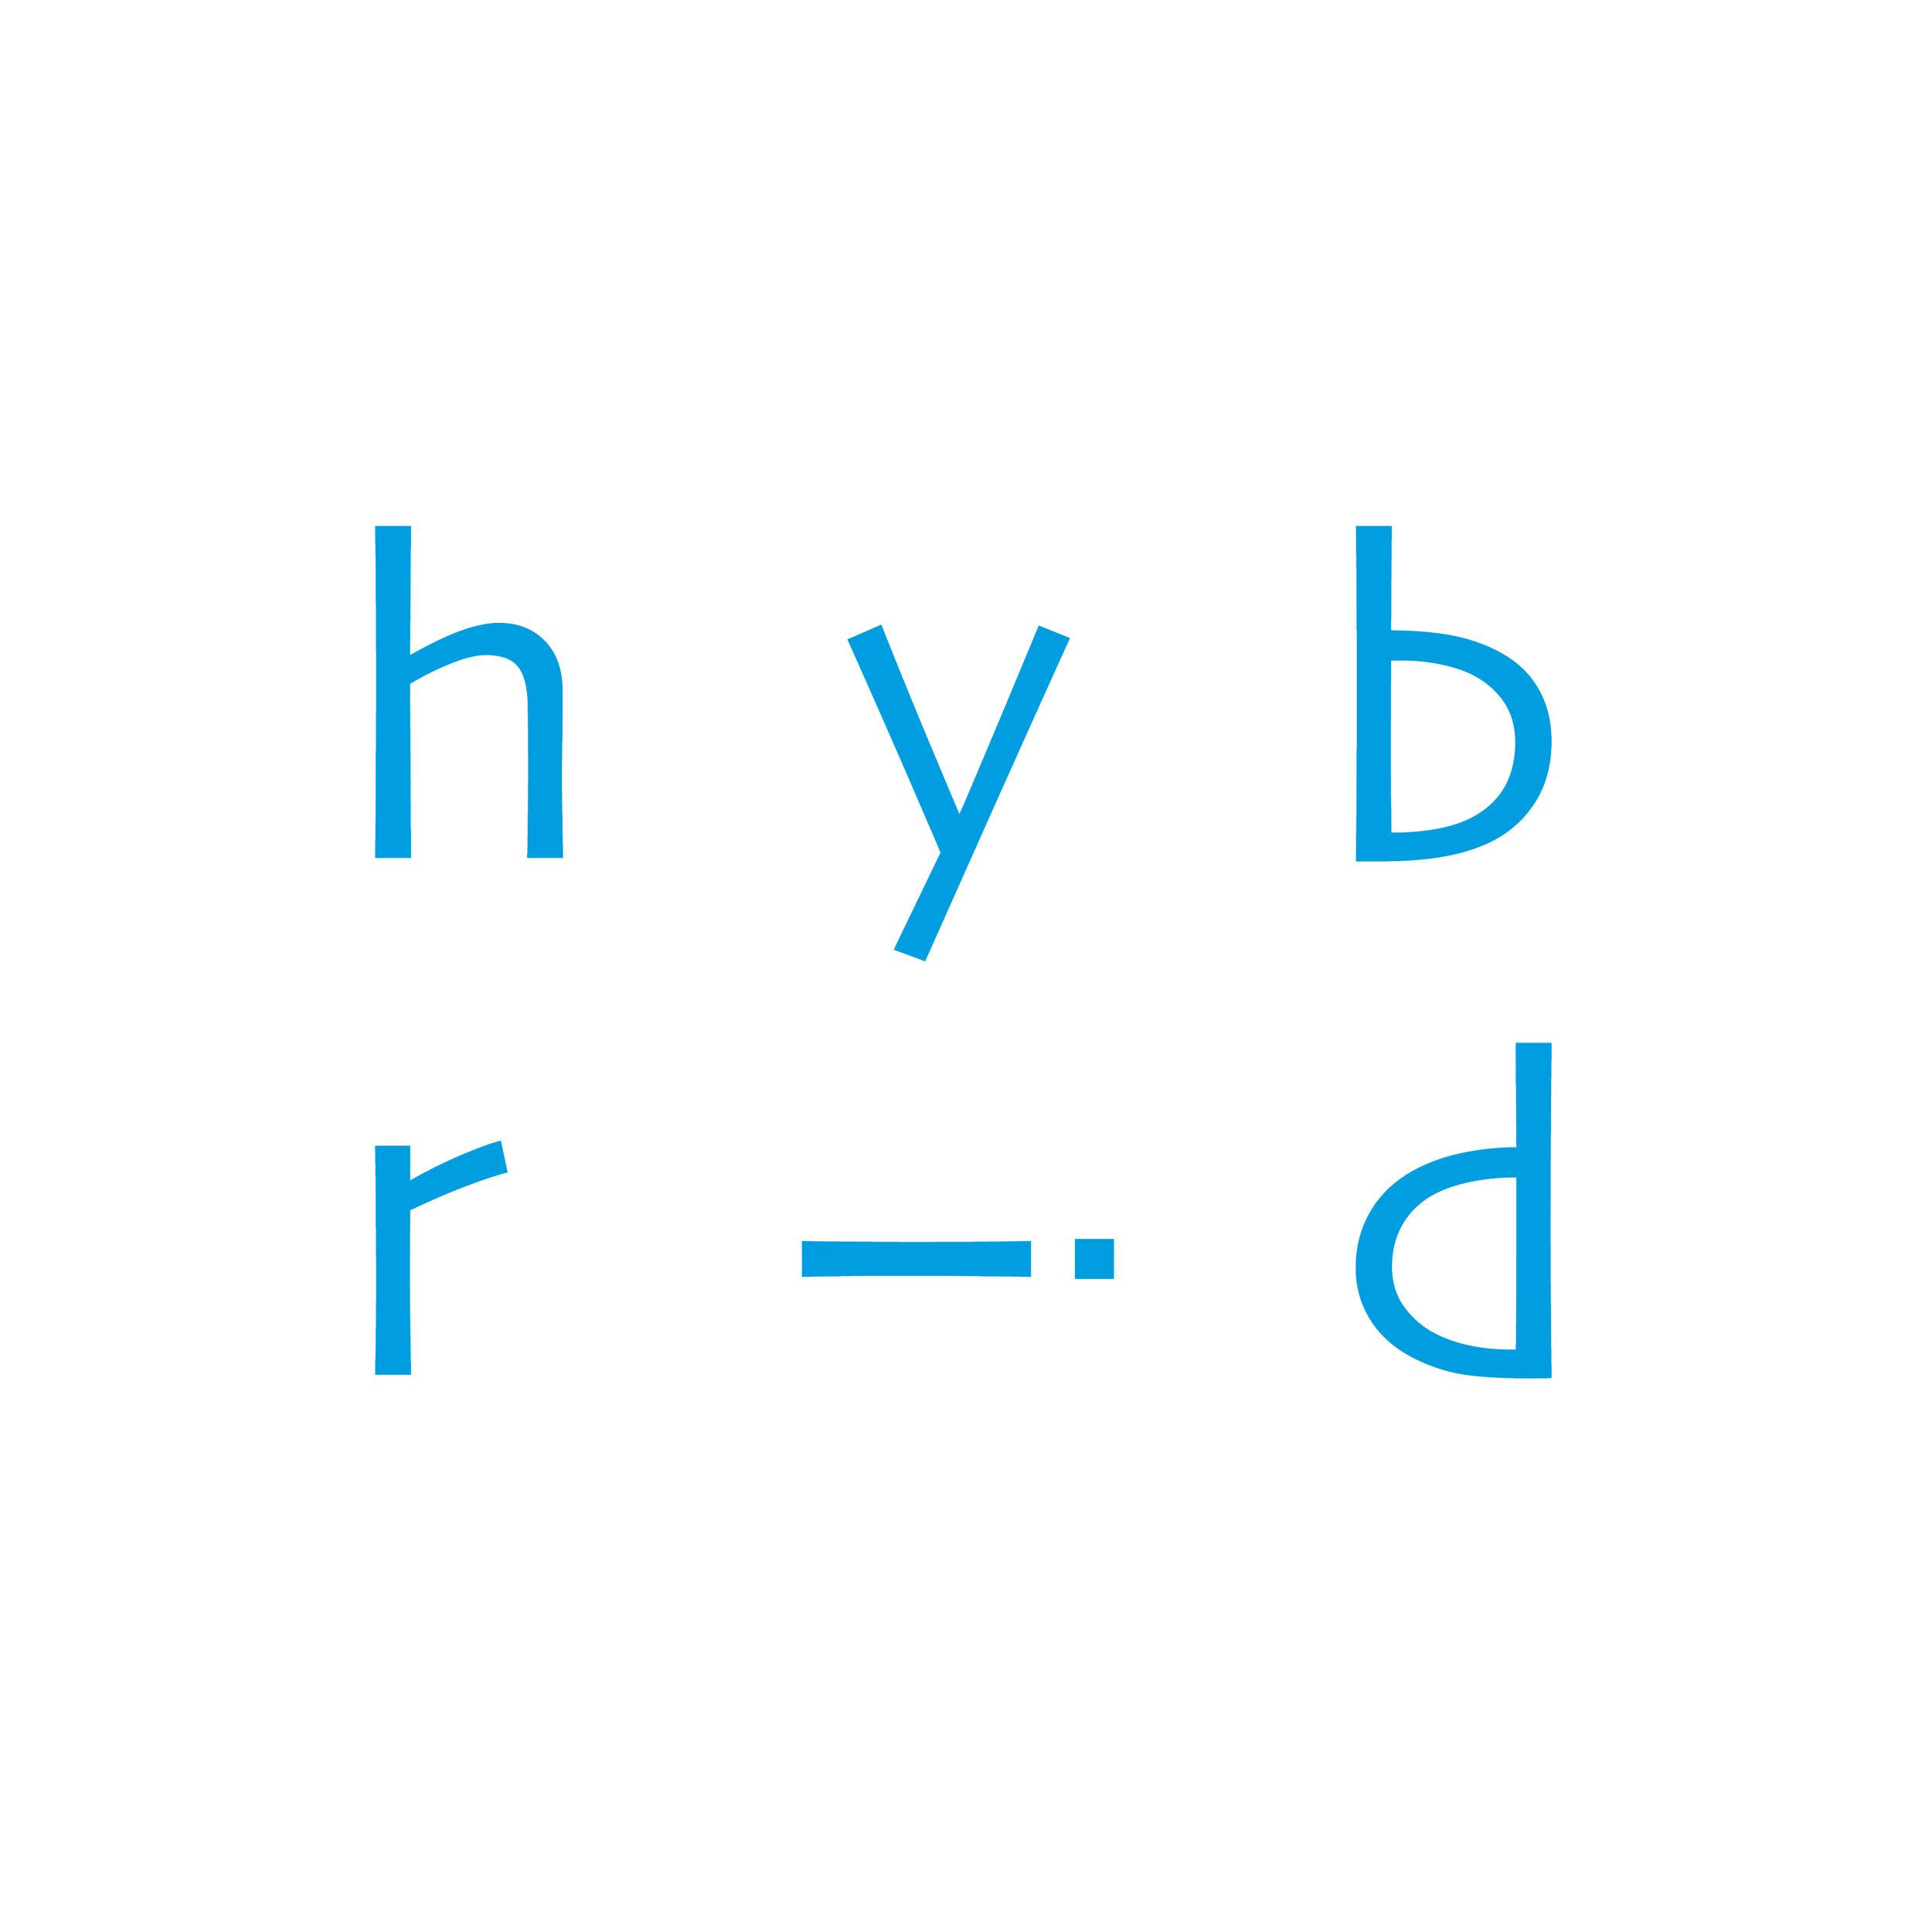 logo_HYBRID-02 white.jpg